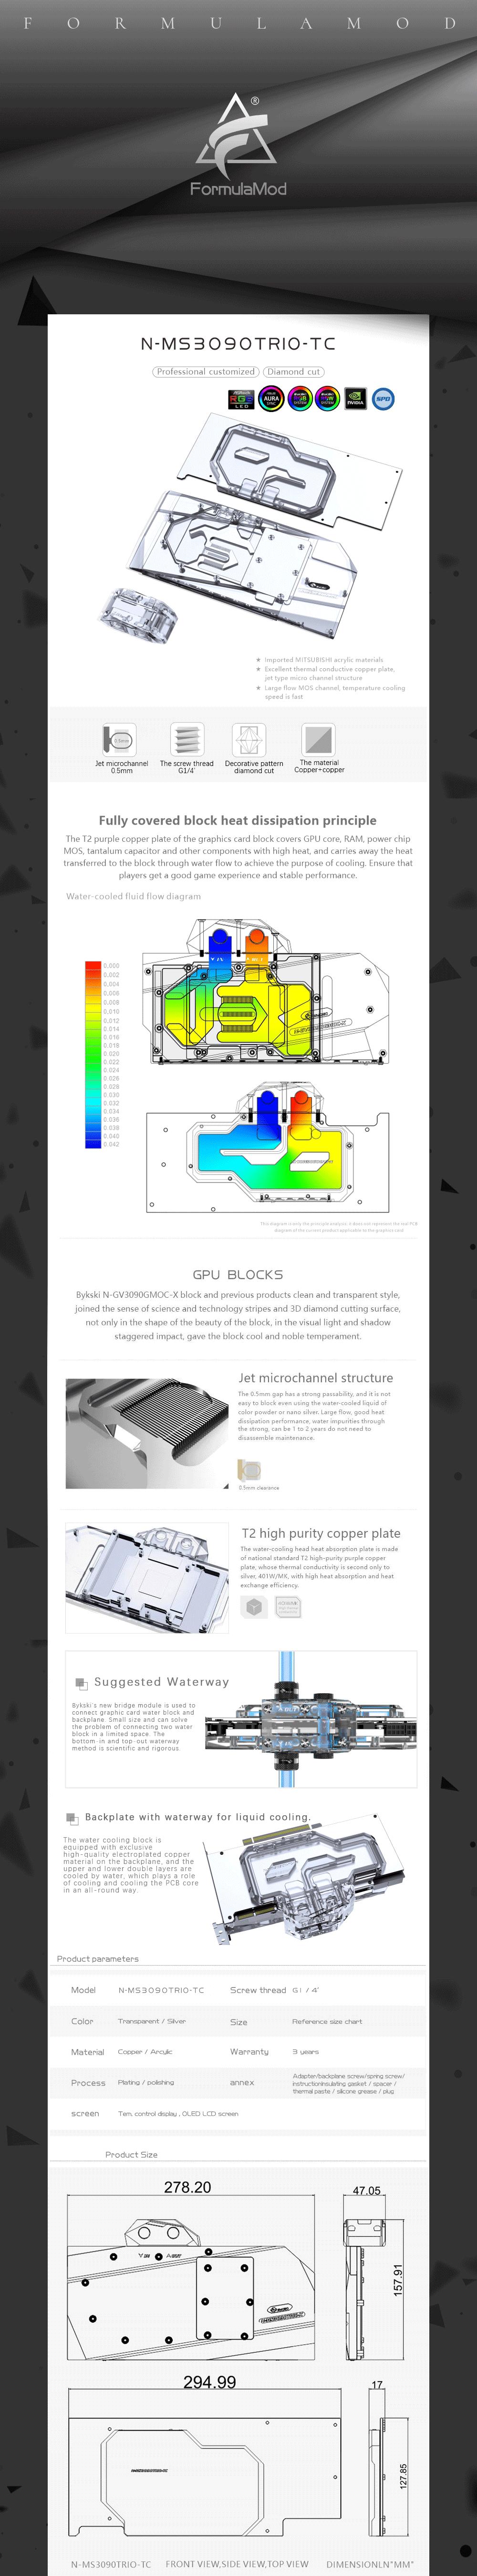 Bykski N-MS3090TRIO-TC GPU Water Block With Waterway Backplane For MSI RTX 3080 3090 GAMING X TRIO / SUPERIM